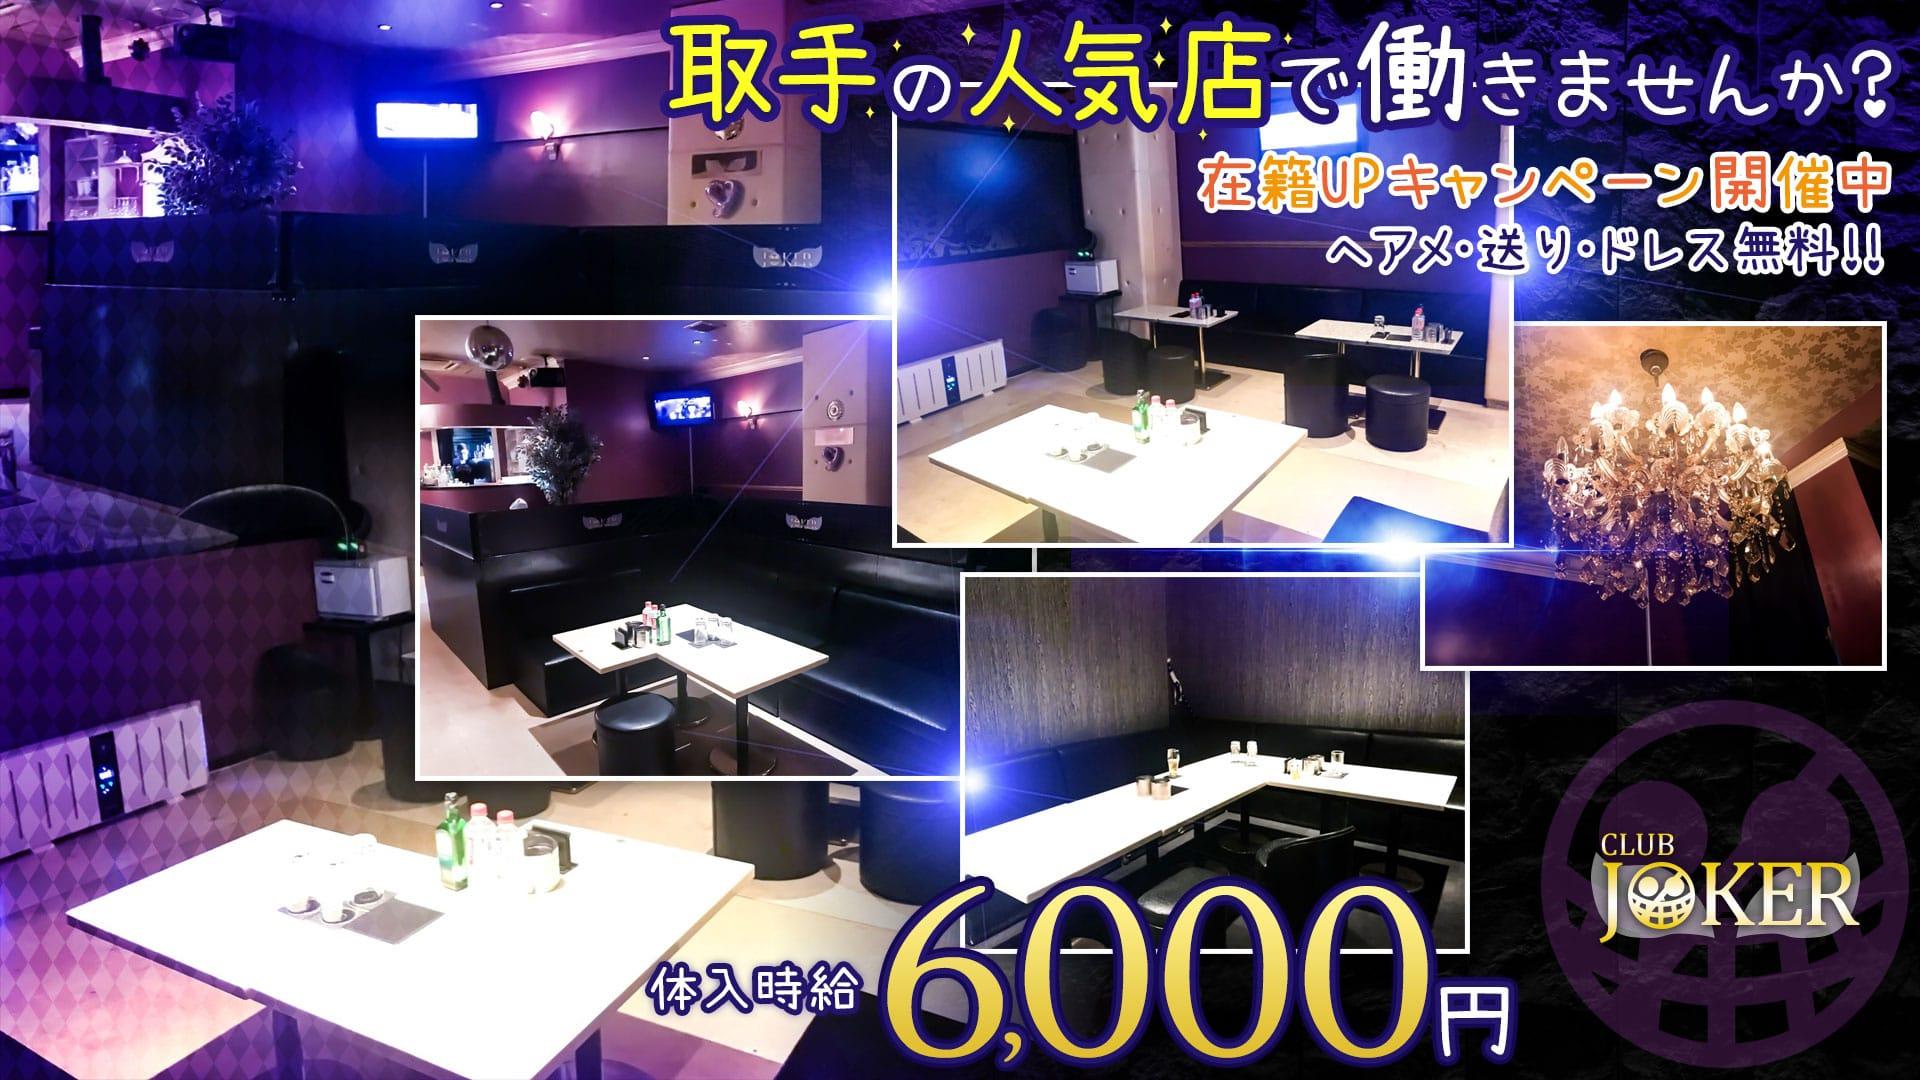 CLUB Joker(クラブ ジョーカー) TOP画像